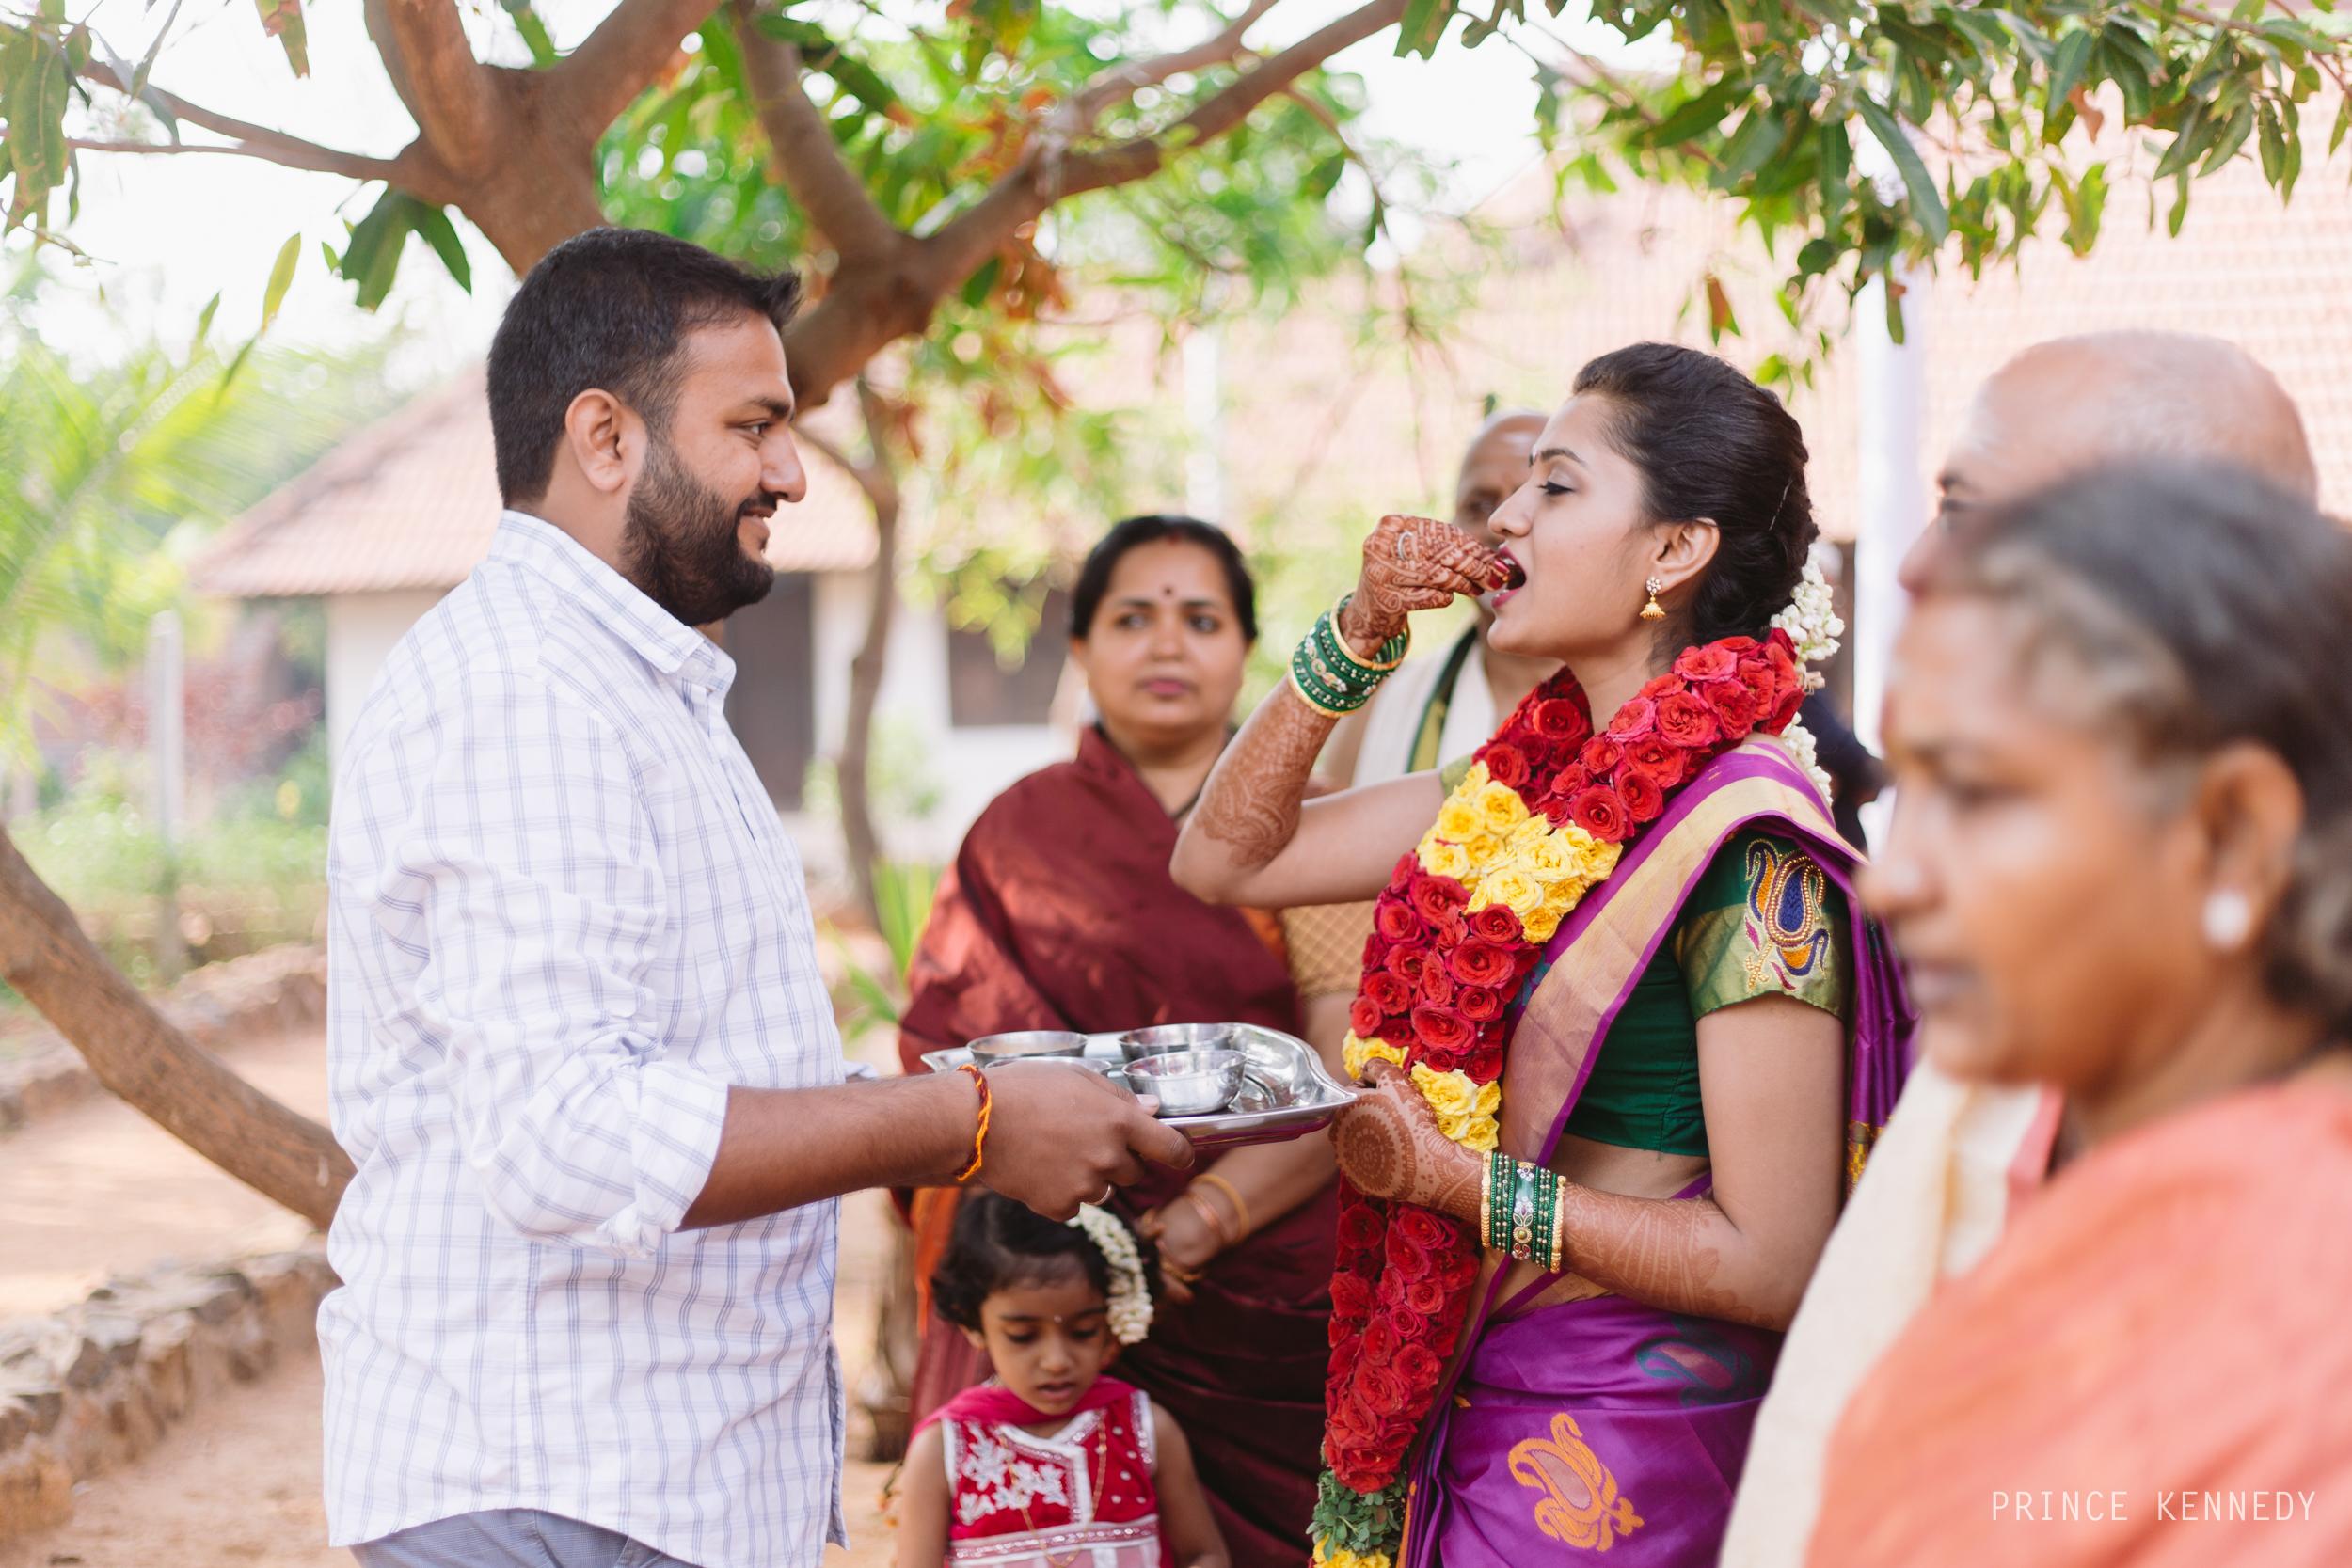 Athmajja-Nithesh-Engagement-Couple-Portrait-Portraiture-Wedding-Couple-Portrait-Chennai-Photographer-Candid-Photography-Destination-Best-Prince-Kennedy-Photography-40.jpg